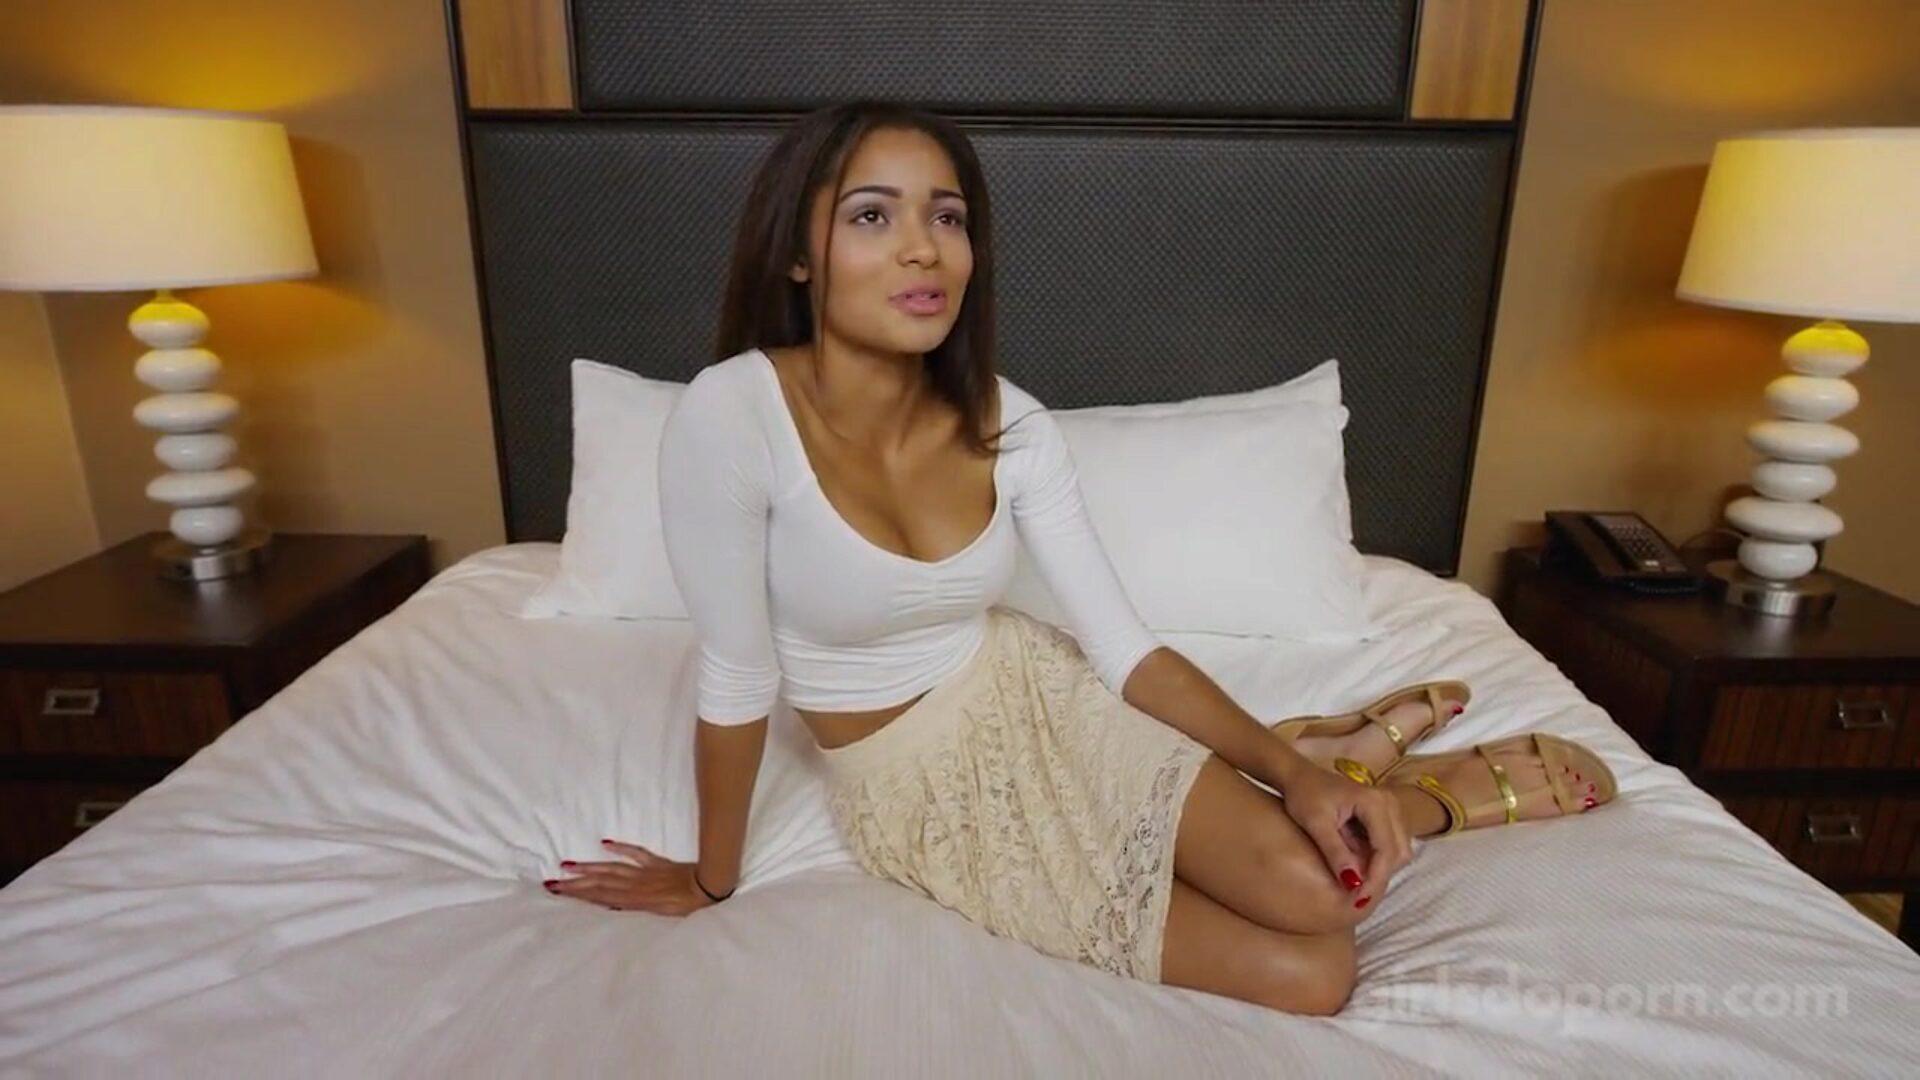 Porner hg 5 Actresses